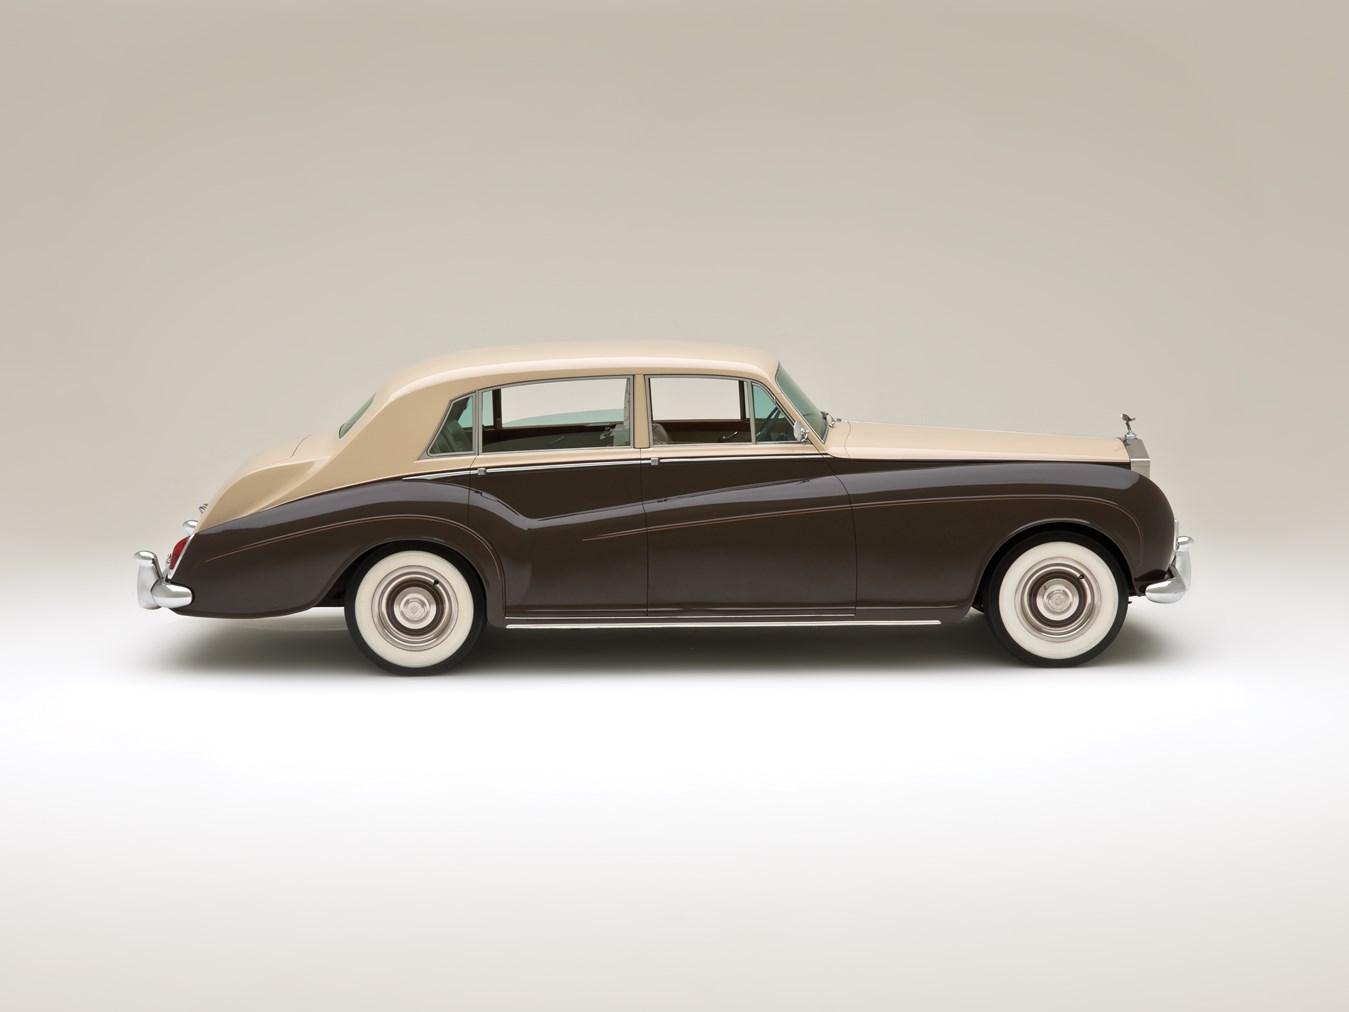 1966 Rolls-Royce Silver Cloud III Touring Limousine profile